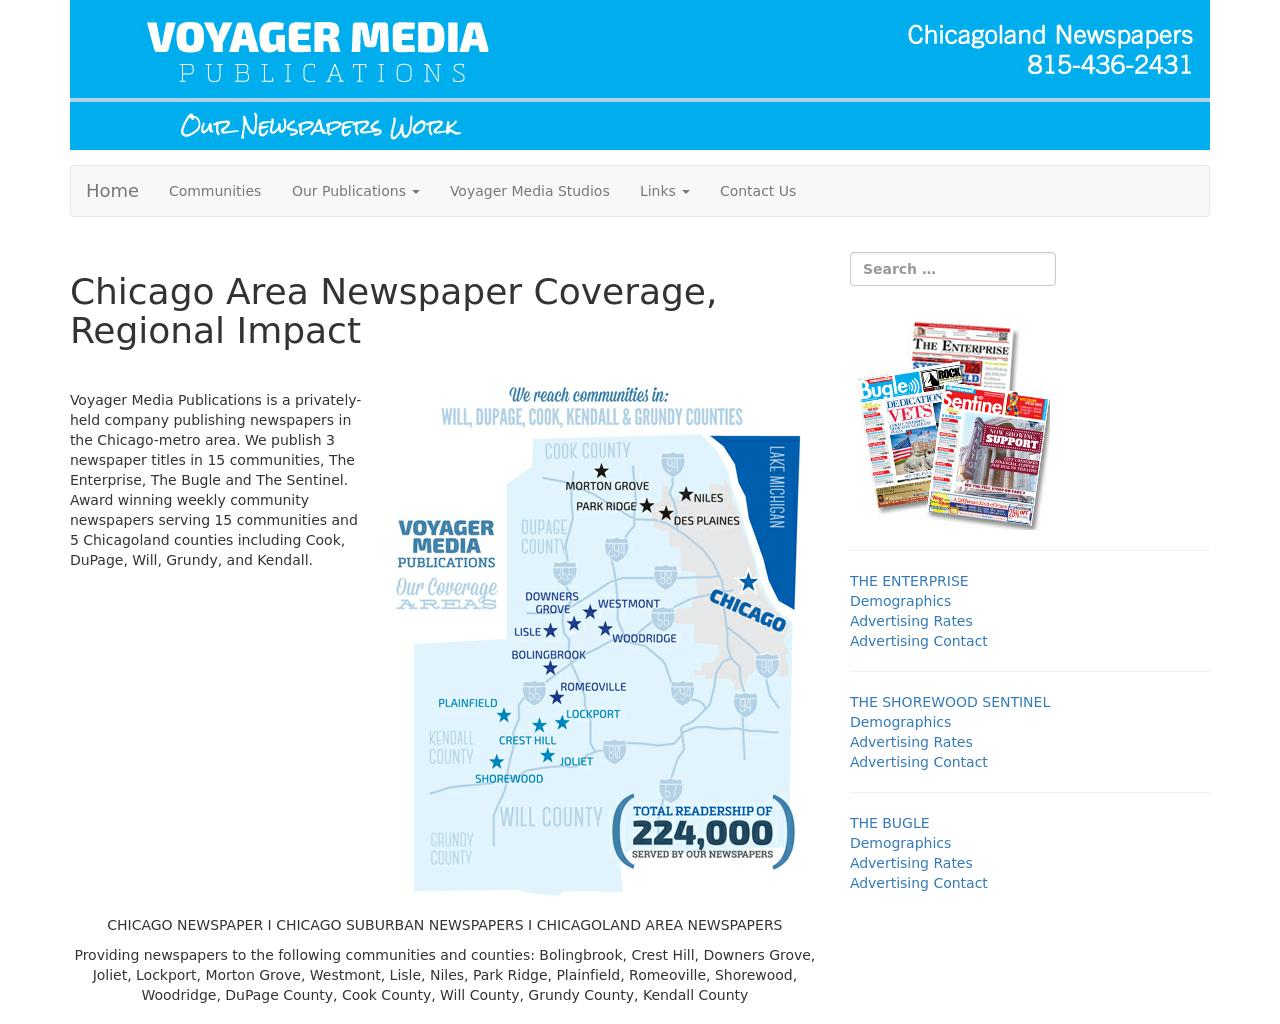 Voyager-Media-Advertising-Reviews-Pricing